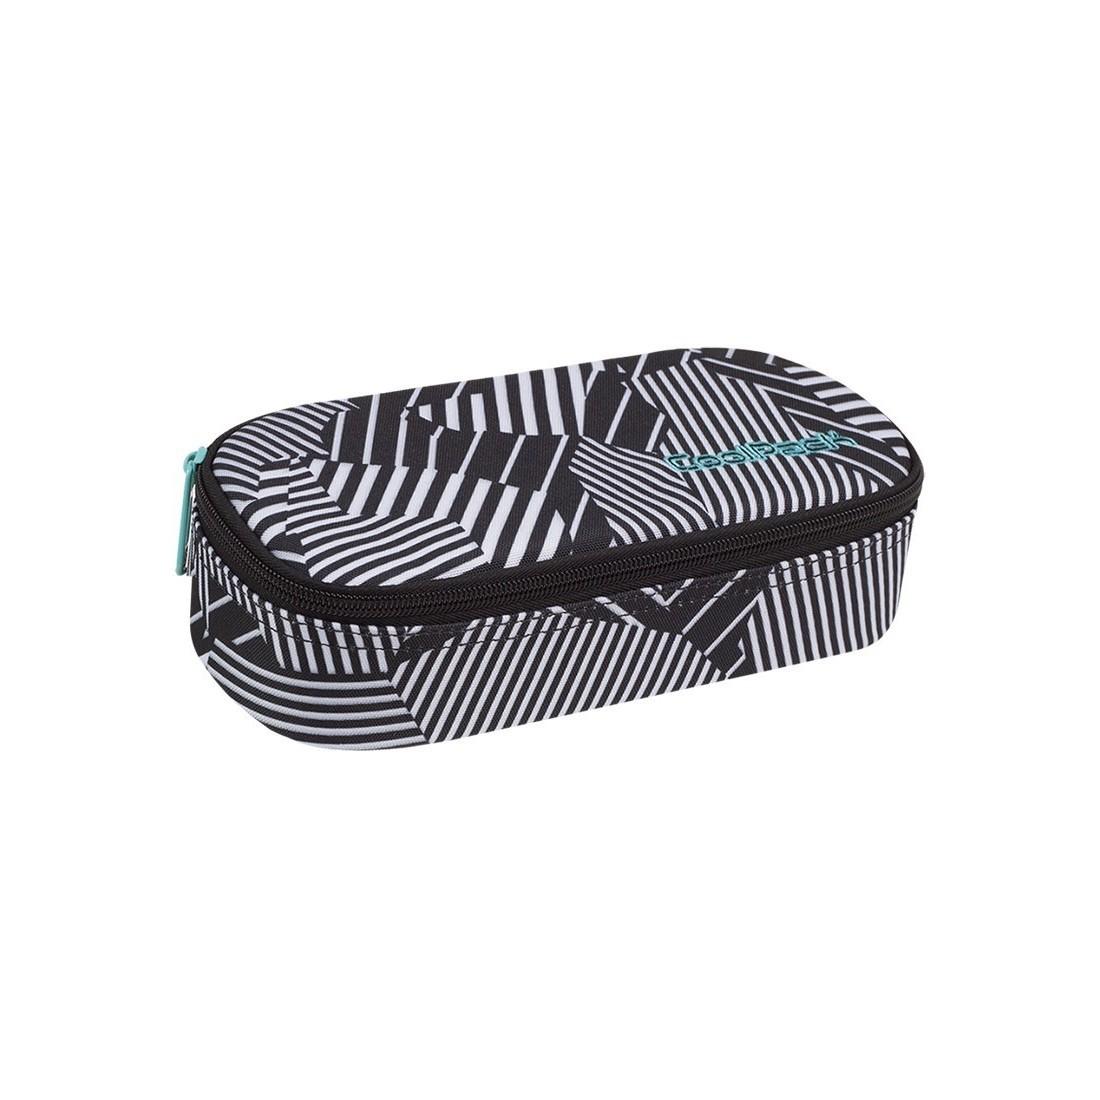 af44f19af7a5 Piórnik szkolny   etui czarno - biała zebra CoolPack CP CAMPUS Black   White  ...